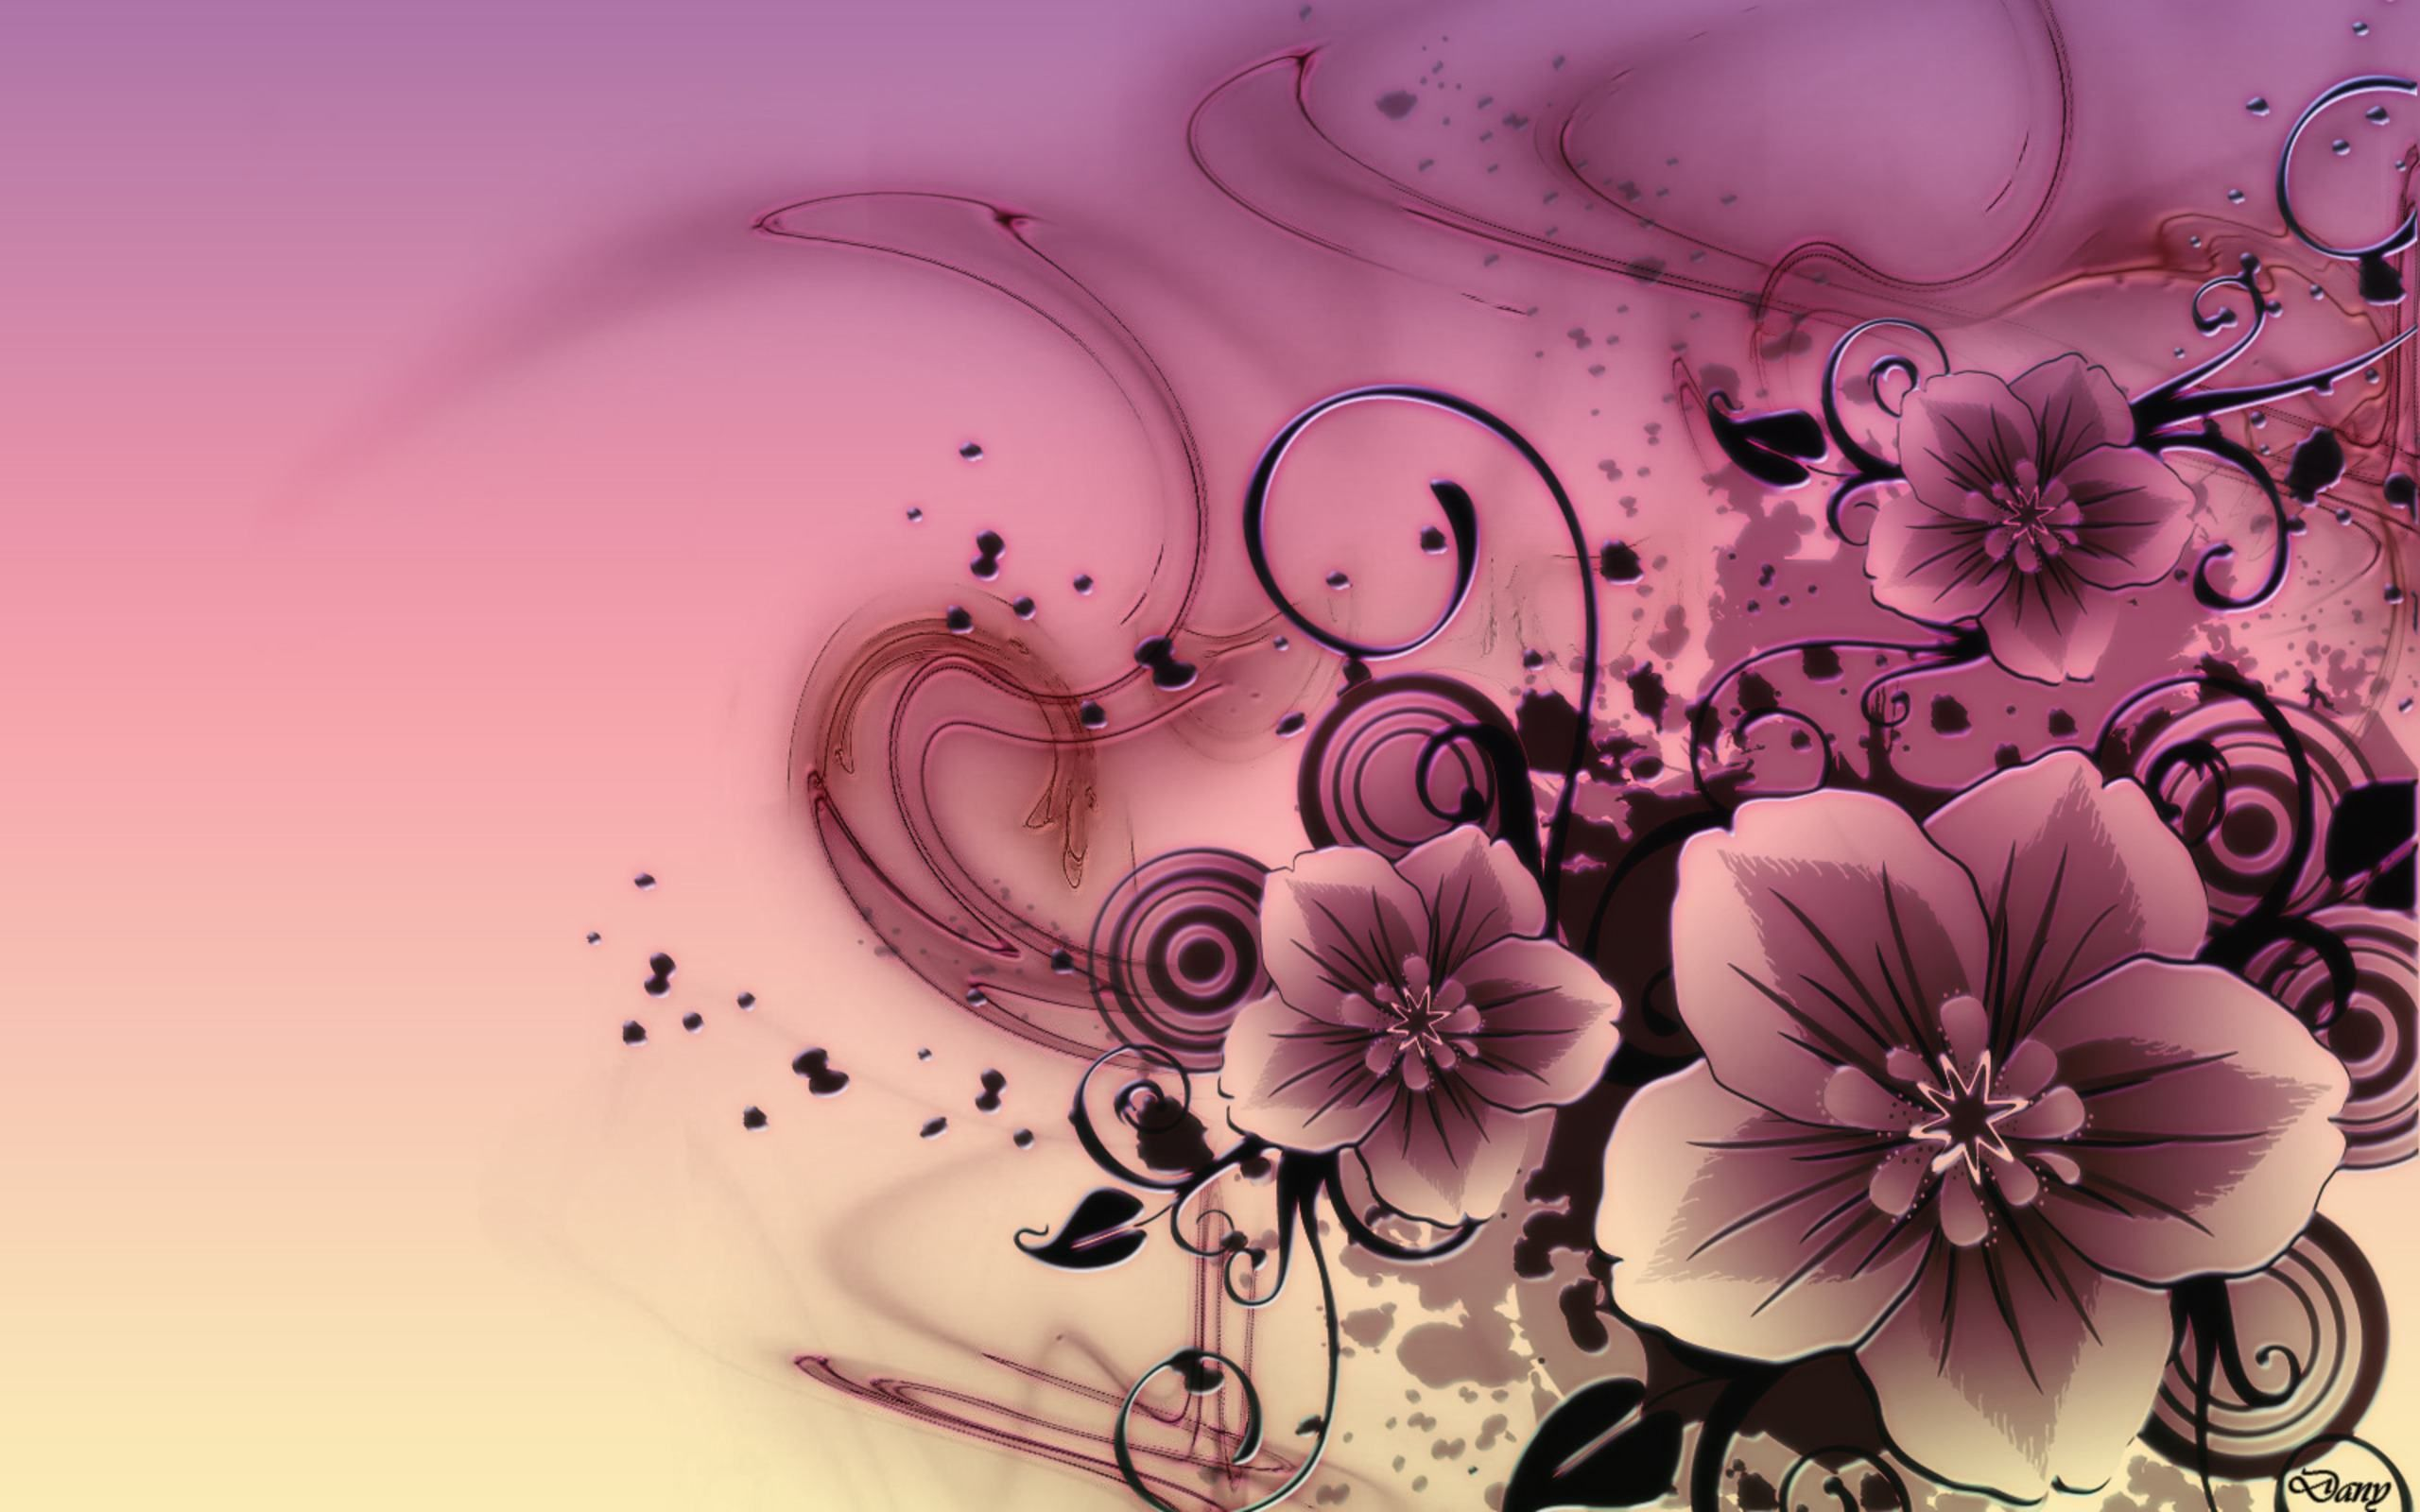 Desktop Full Screen Image Size Google Search Free Flower Wallpaper Pink Abstract Flower Wallpaper